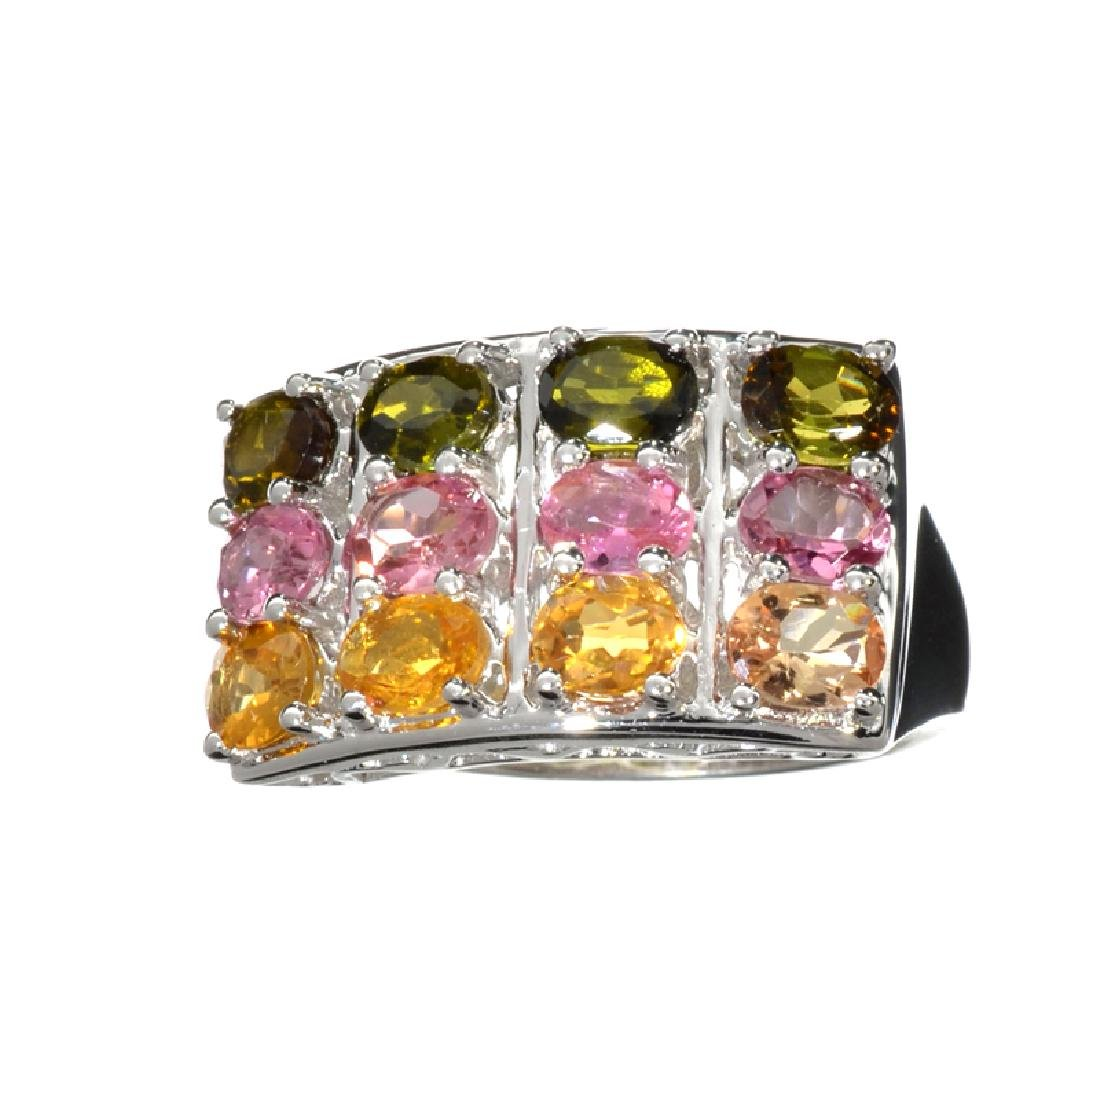 3.72CT Oval Cut Multi-Colored, Multi Precious Gemstones